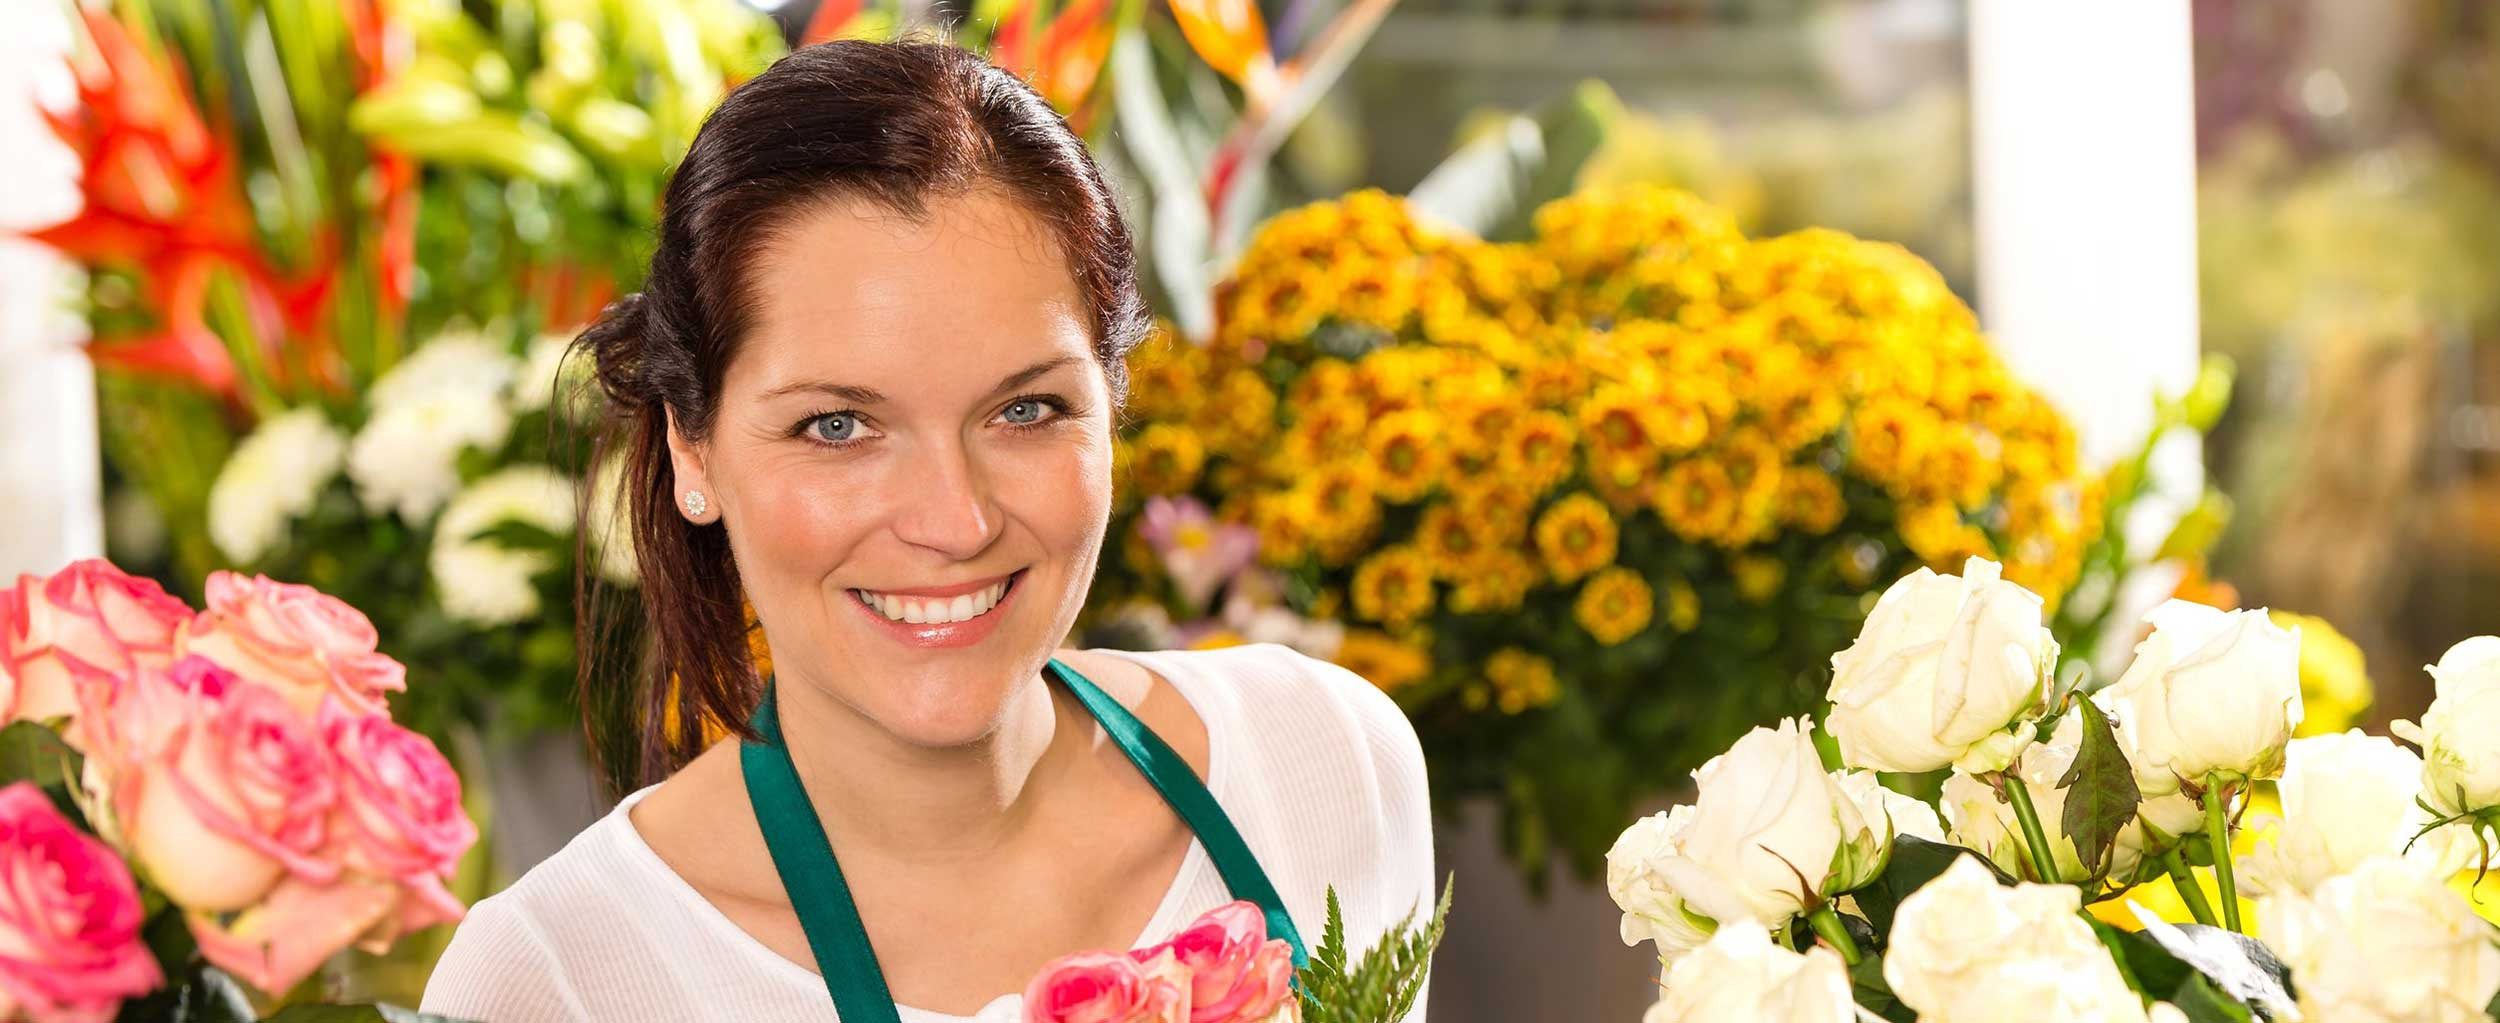 florist-shop-owner